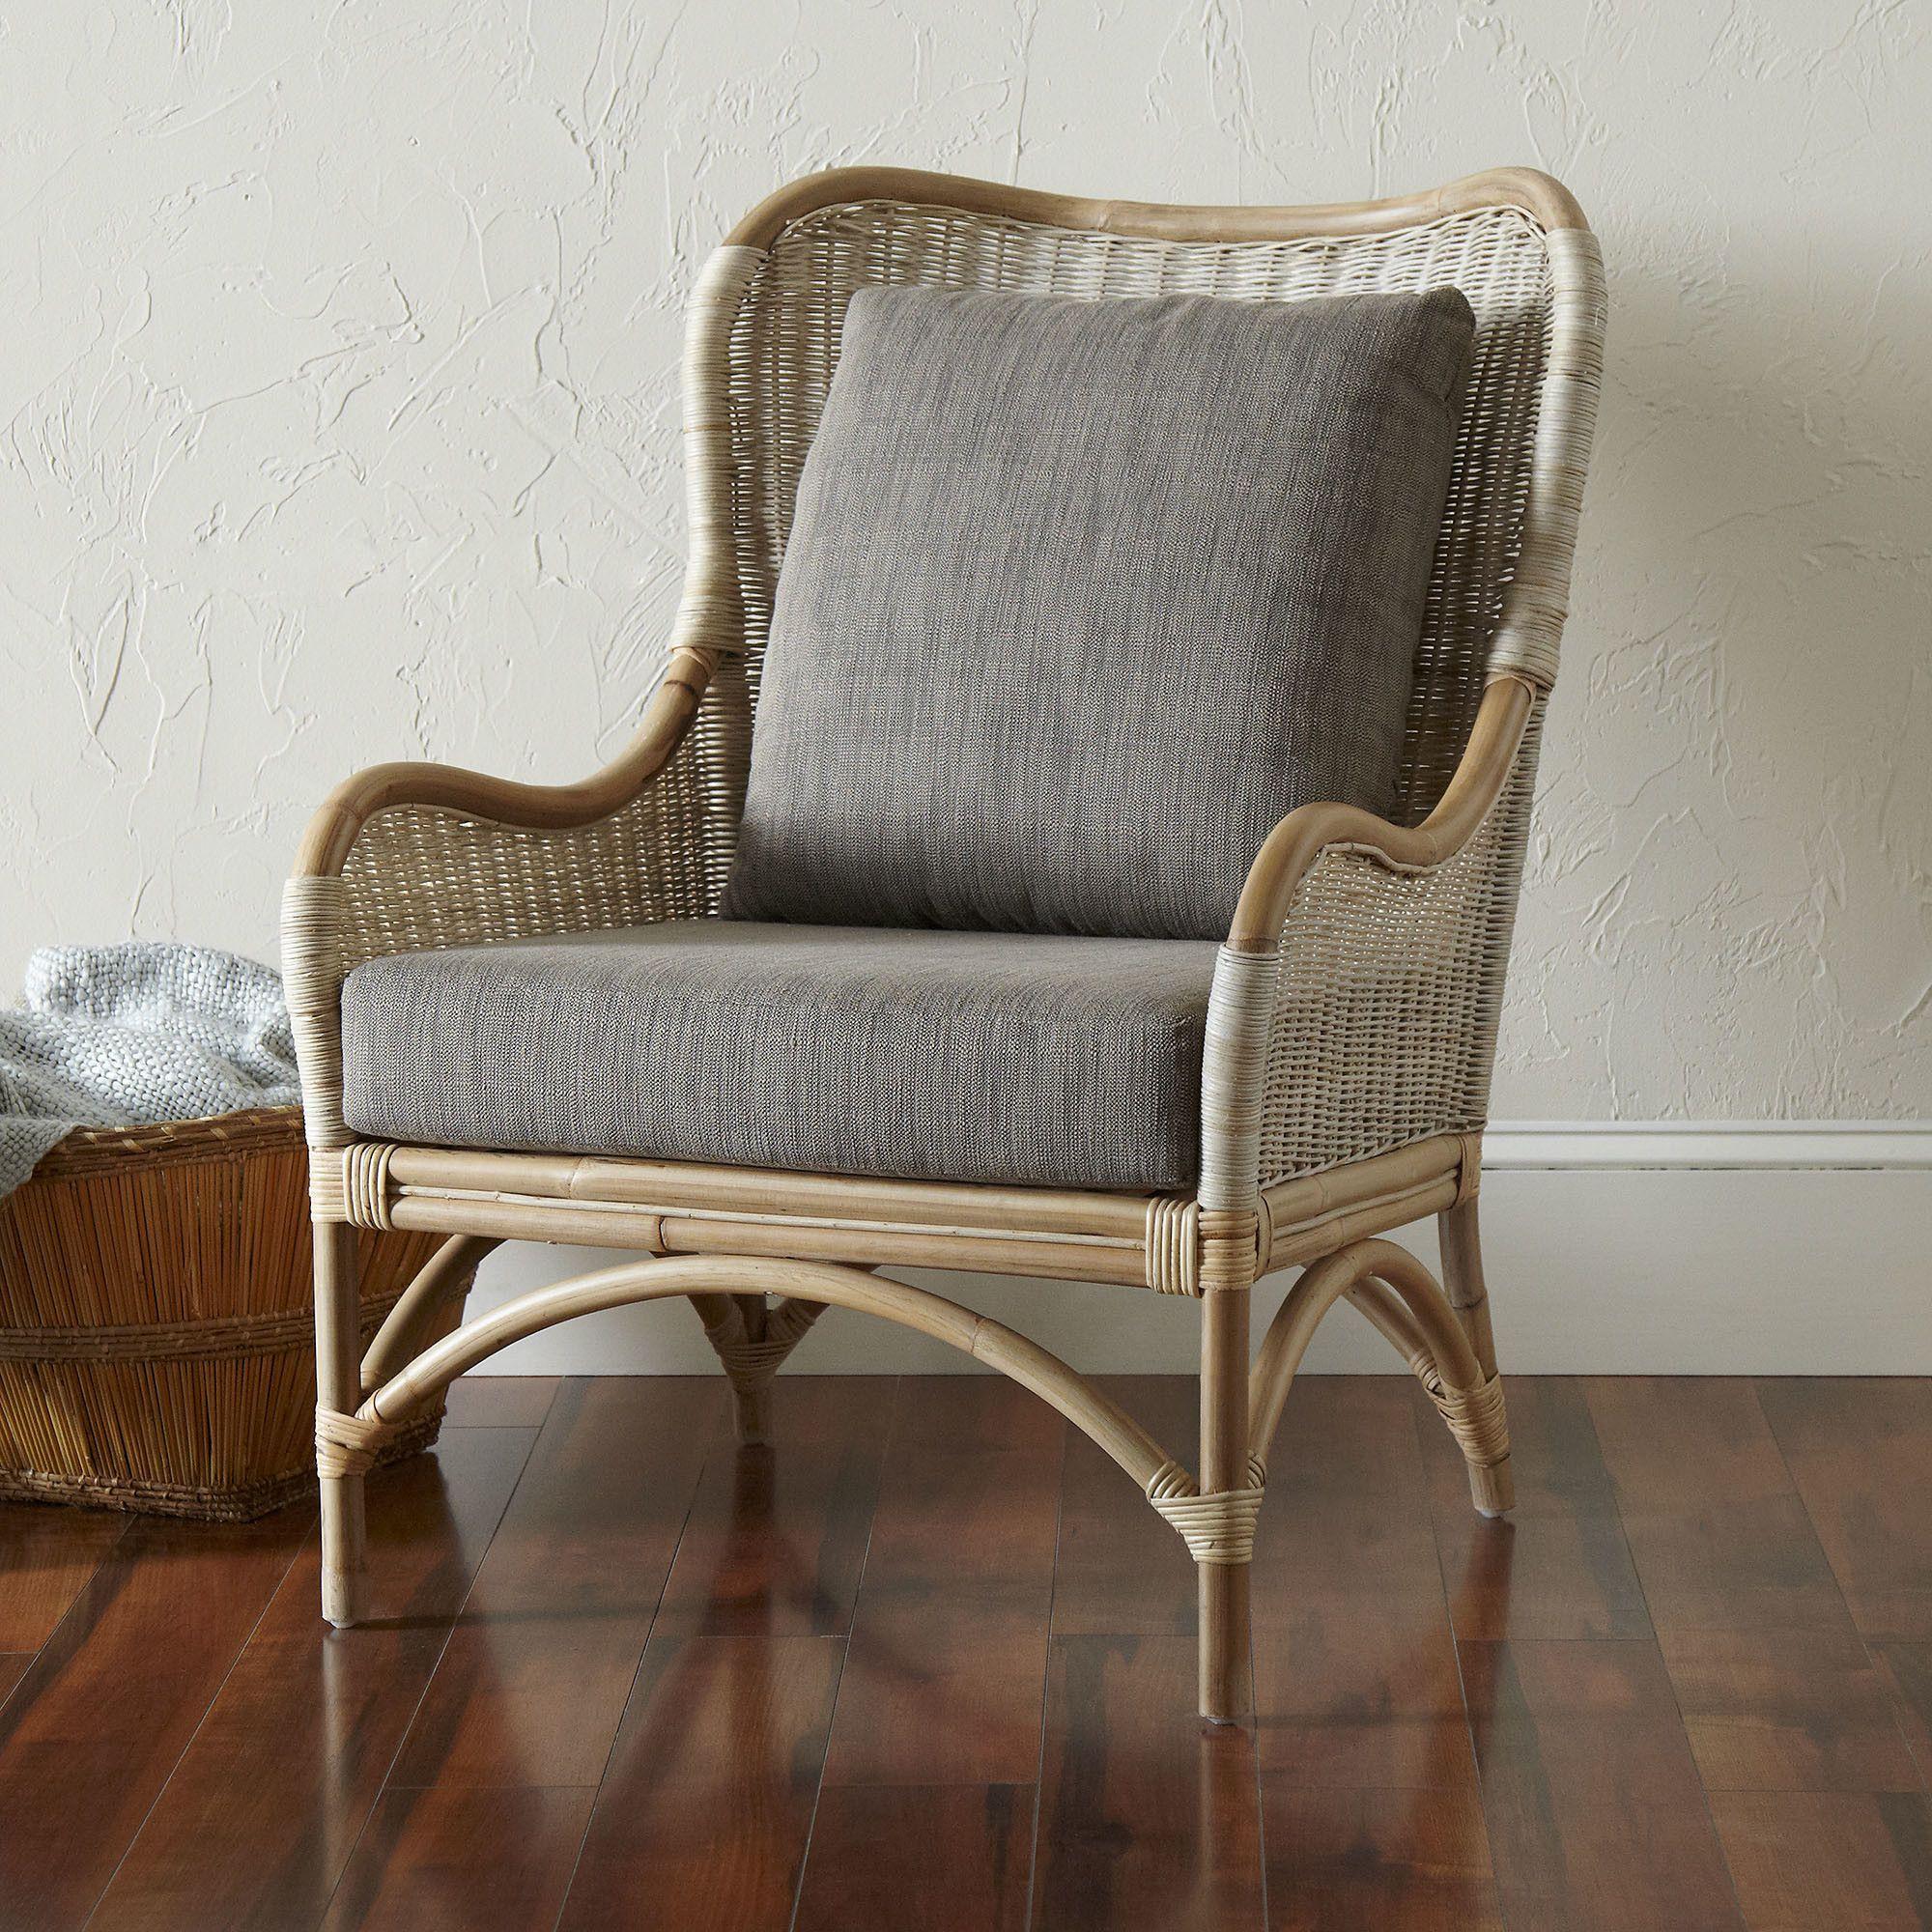 Birch-Lane-Broussard-Rattan-Chair.jpg (2000×2000)